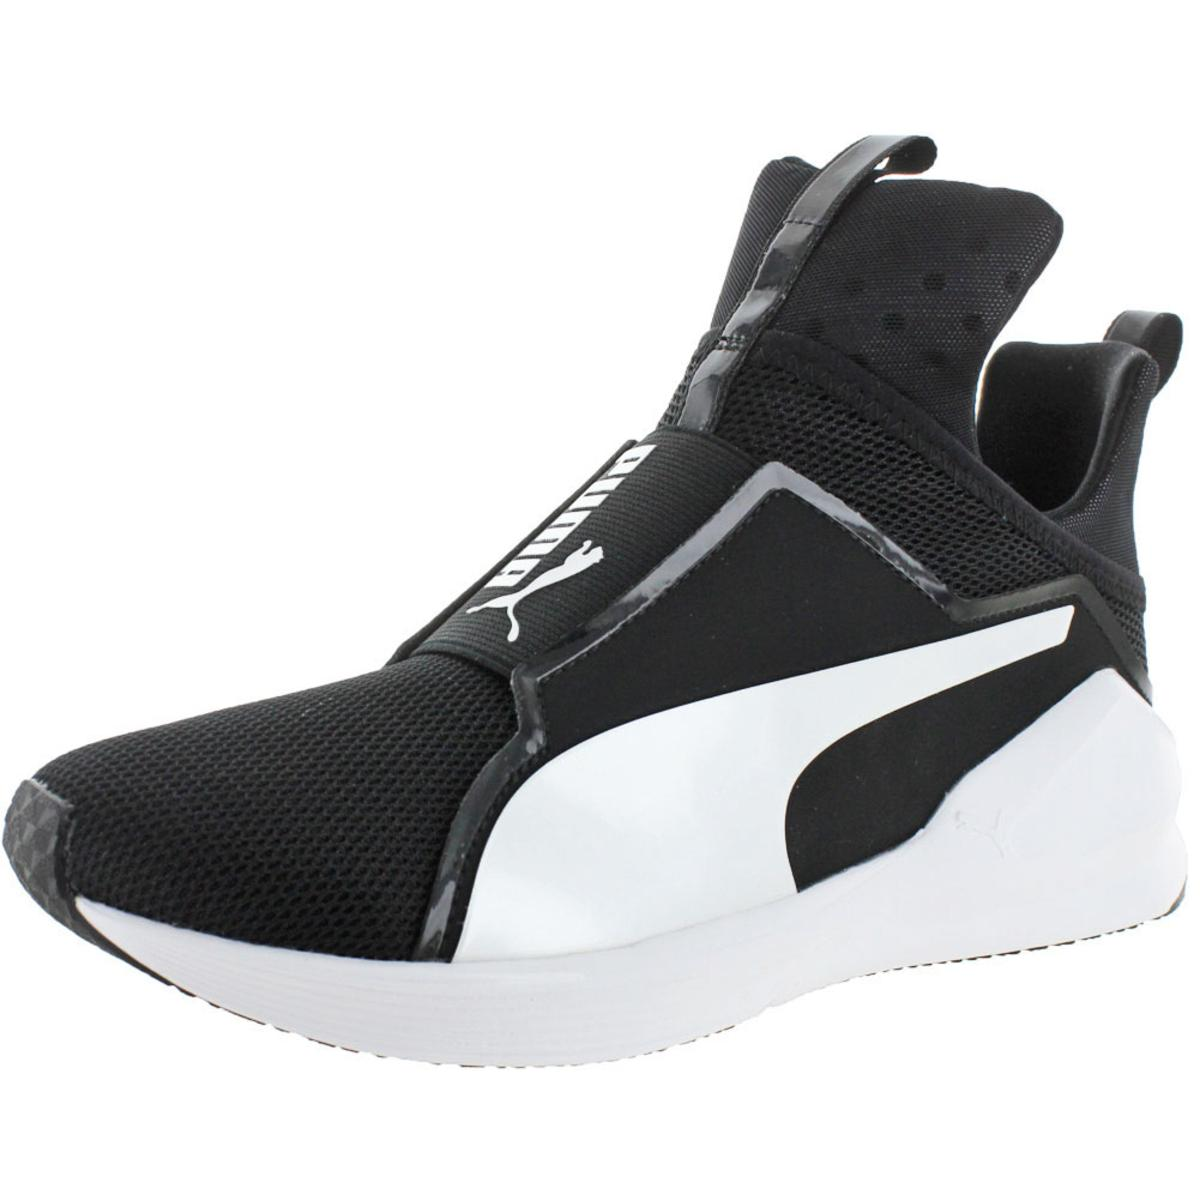 9eaedd803 Details about Puma Womens Fierce Core Black Fashion Sneakers Shoes 10  Medium (B